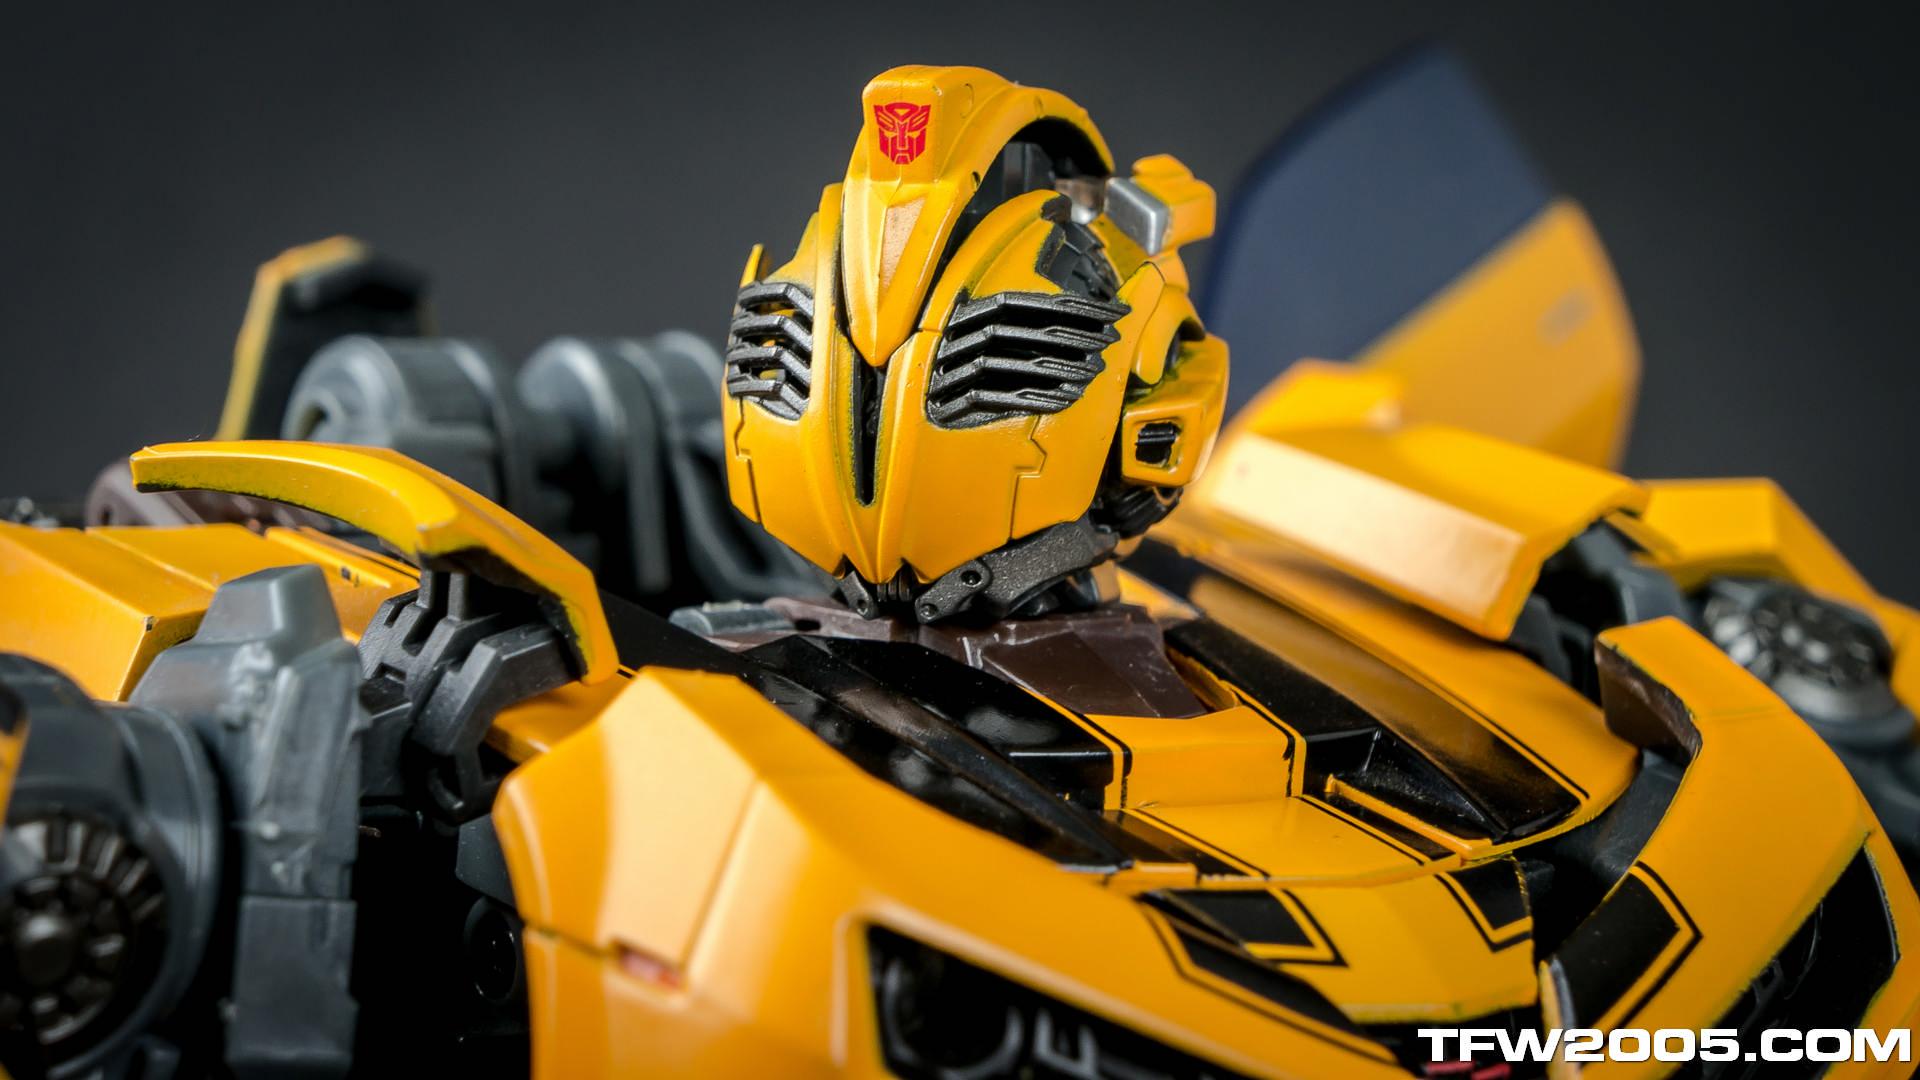 Random Photo Shoot - MPM-2 Bumblebee - Transformers News ...